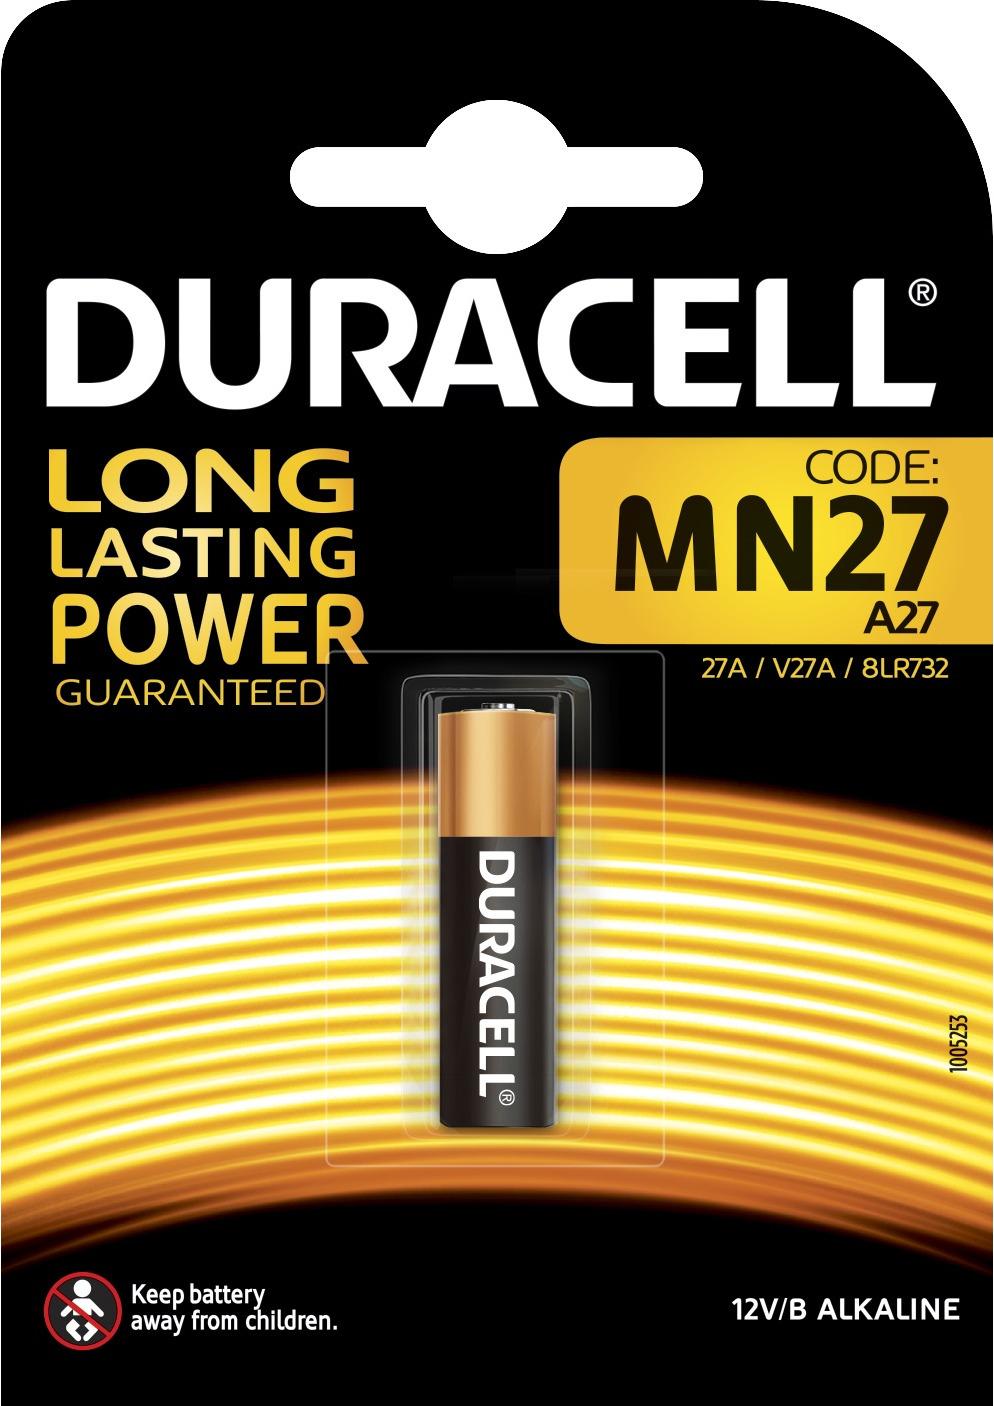 Батарейка алкалиновая Duracell, типоразмер MN27, 12 В батарейка duracell для сигнализаций 12в mn27 1шт